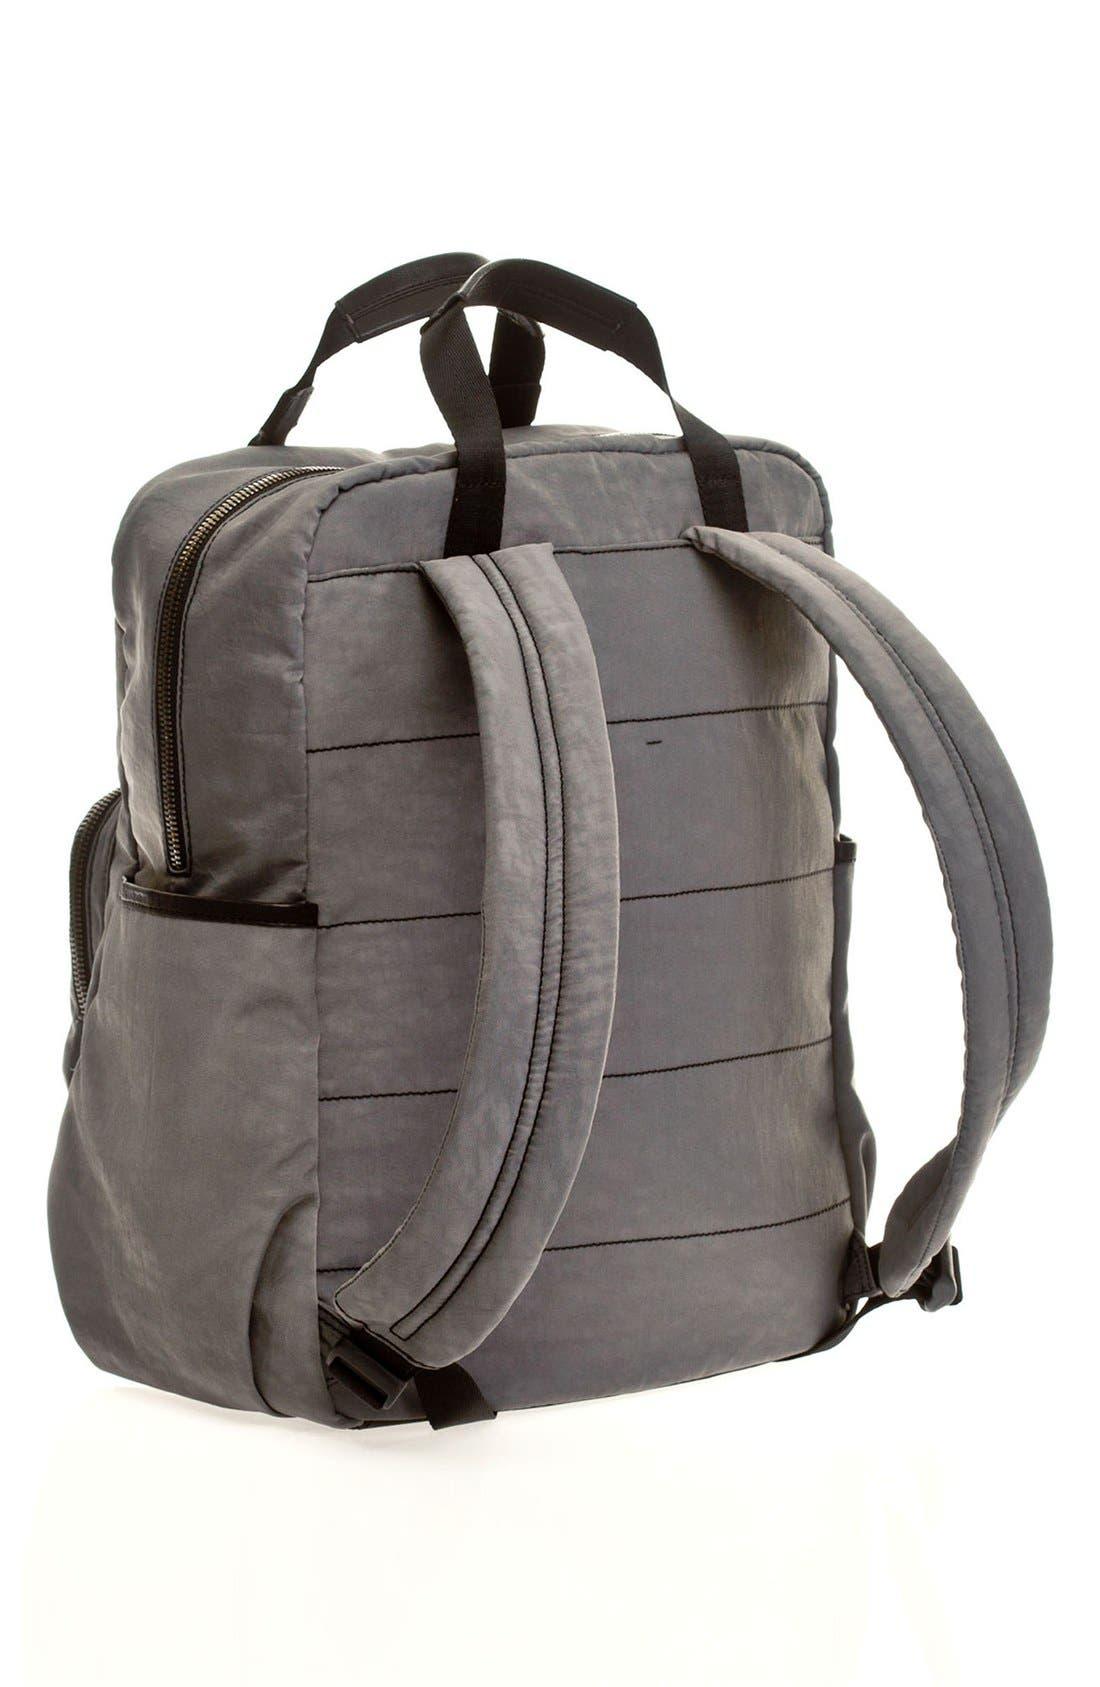 'Courage' Unisex Backpack Diaper Bag,                             Alternate thumbnail 4, color,                             020